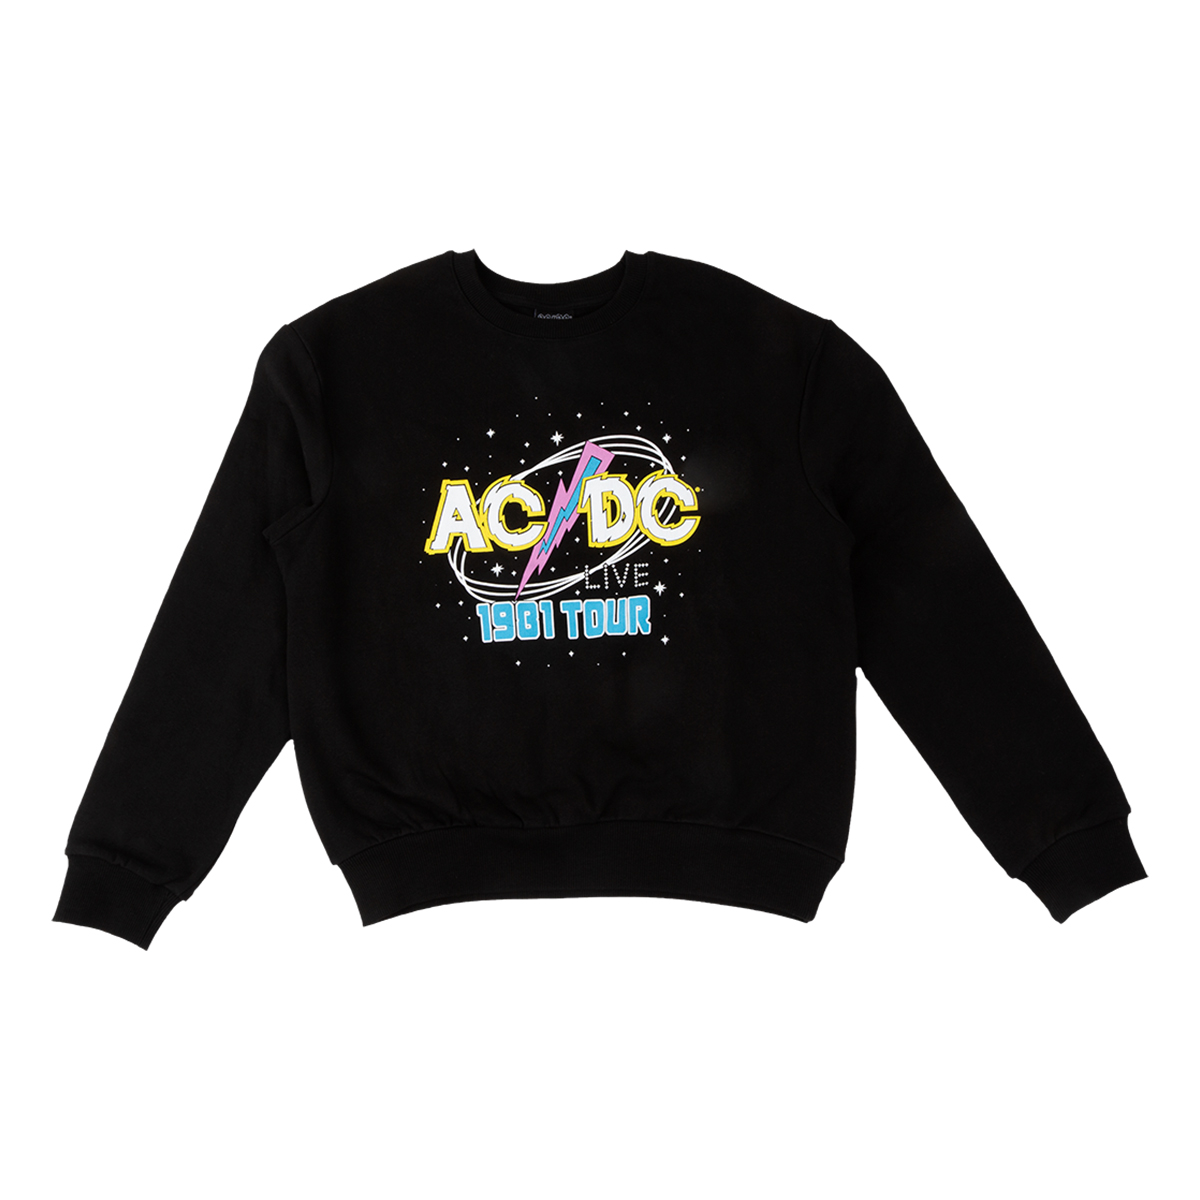 AC/DC Live 1981 Tour Crew Neck Sweatshirt